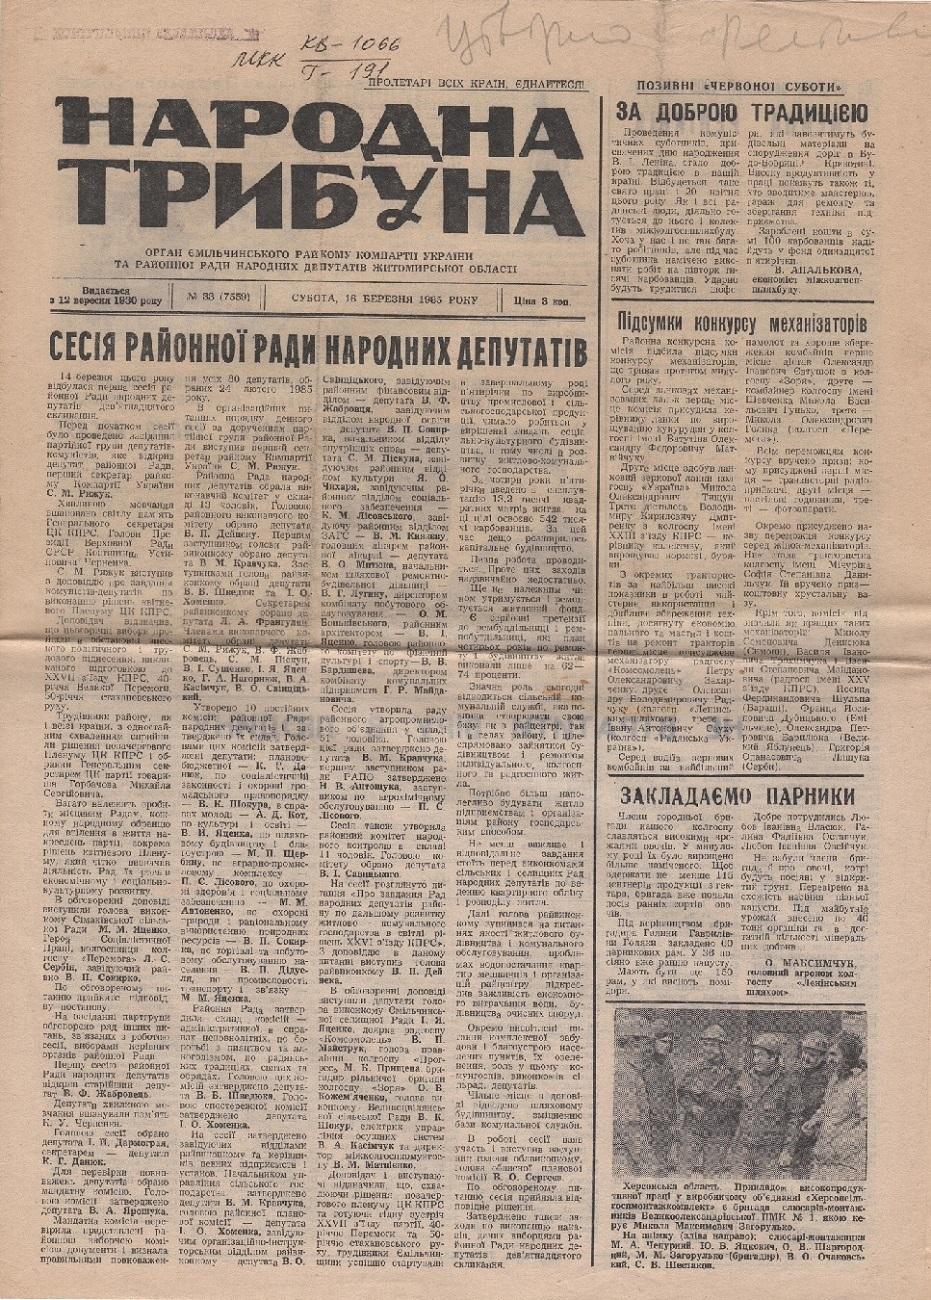 "Газети. Газета Народна трибуна"" субота, 16 березня 1985 р. № 33 (7559)"